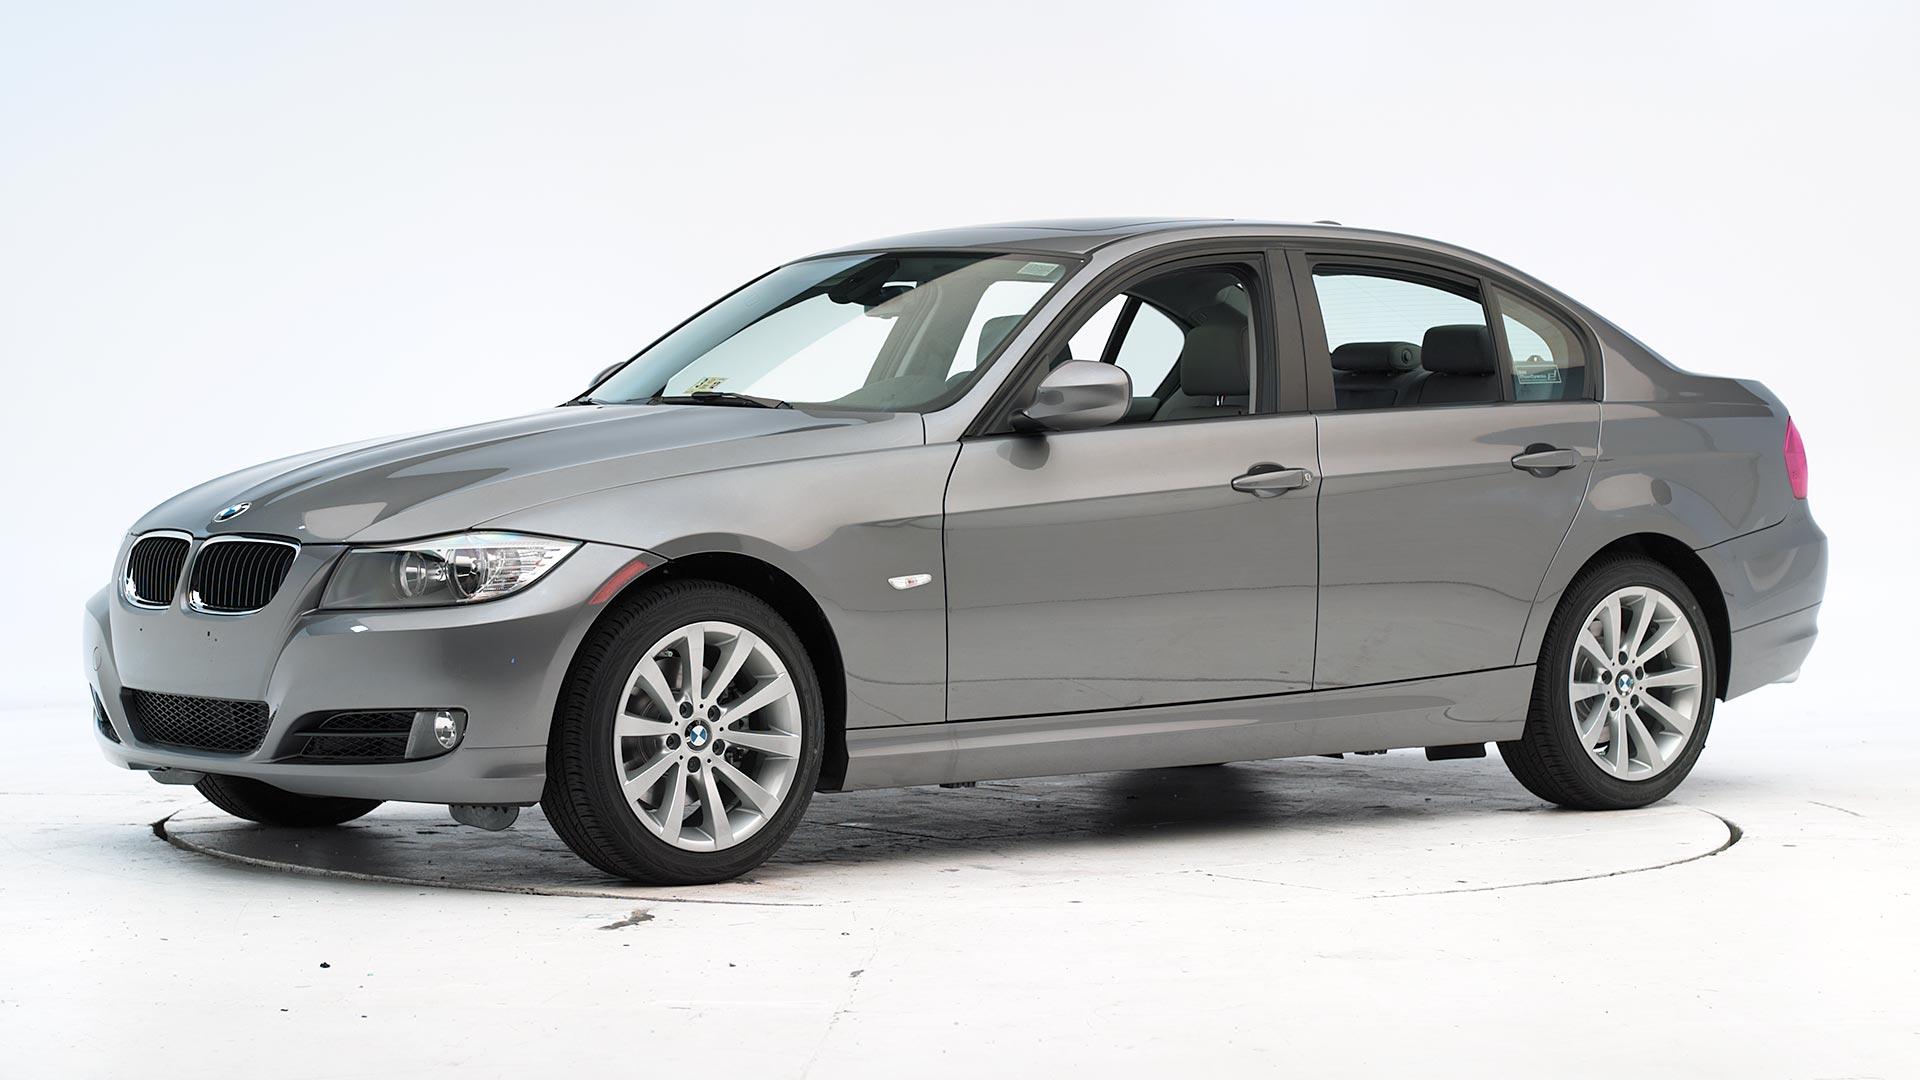 hight resolution of 2011 bmw 3 series 4 door sedan